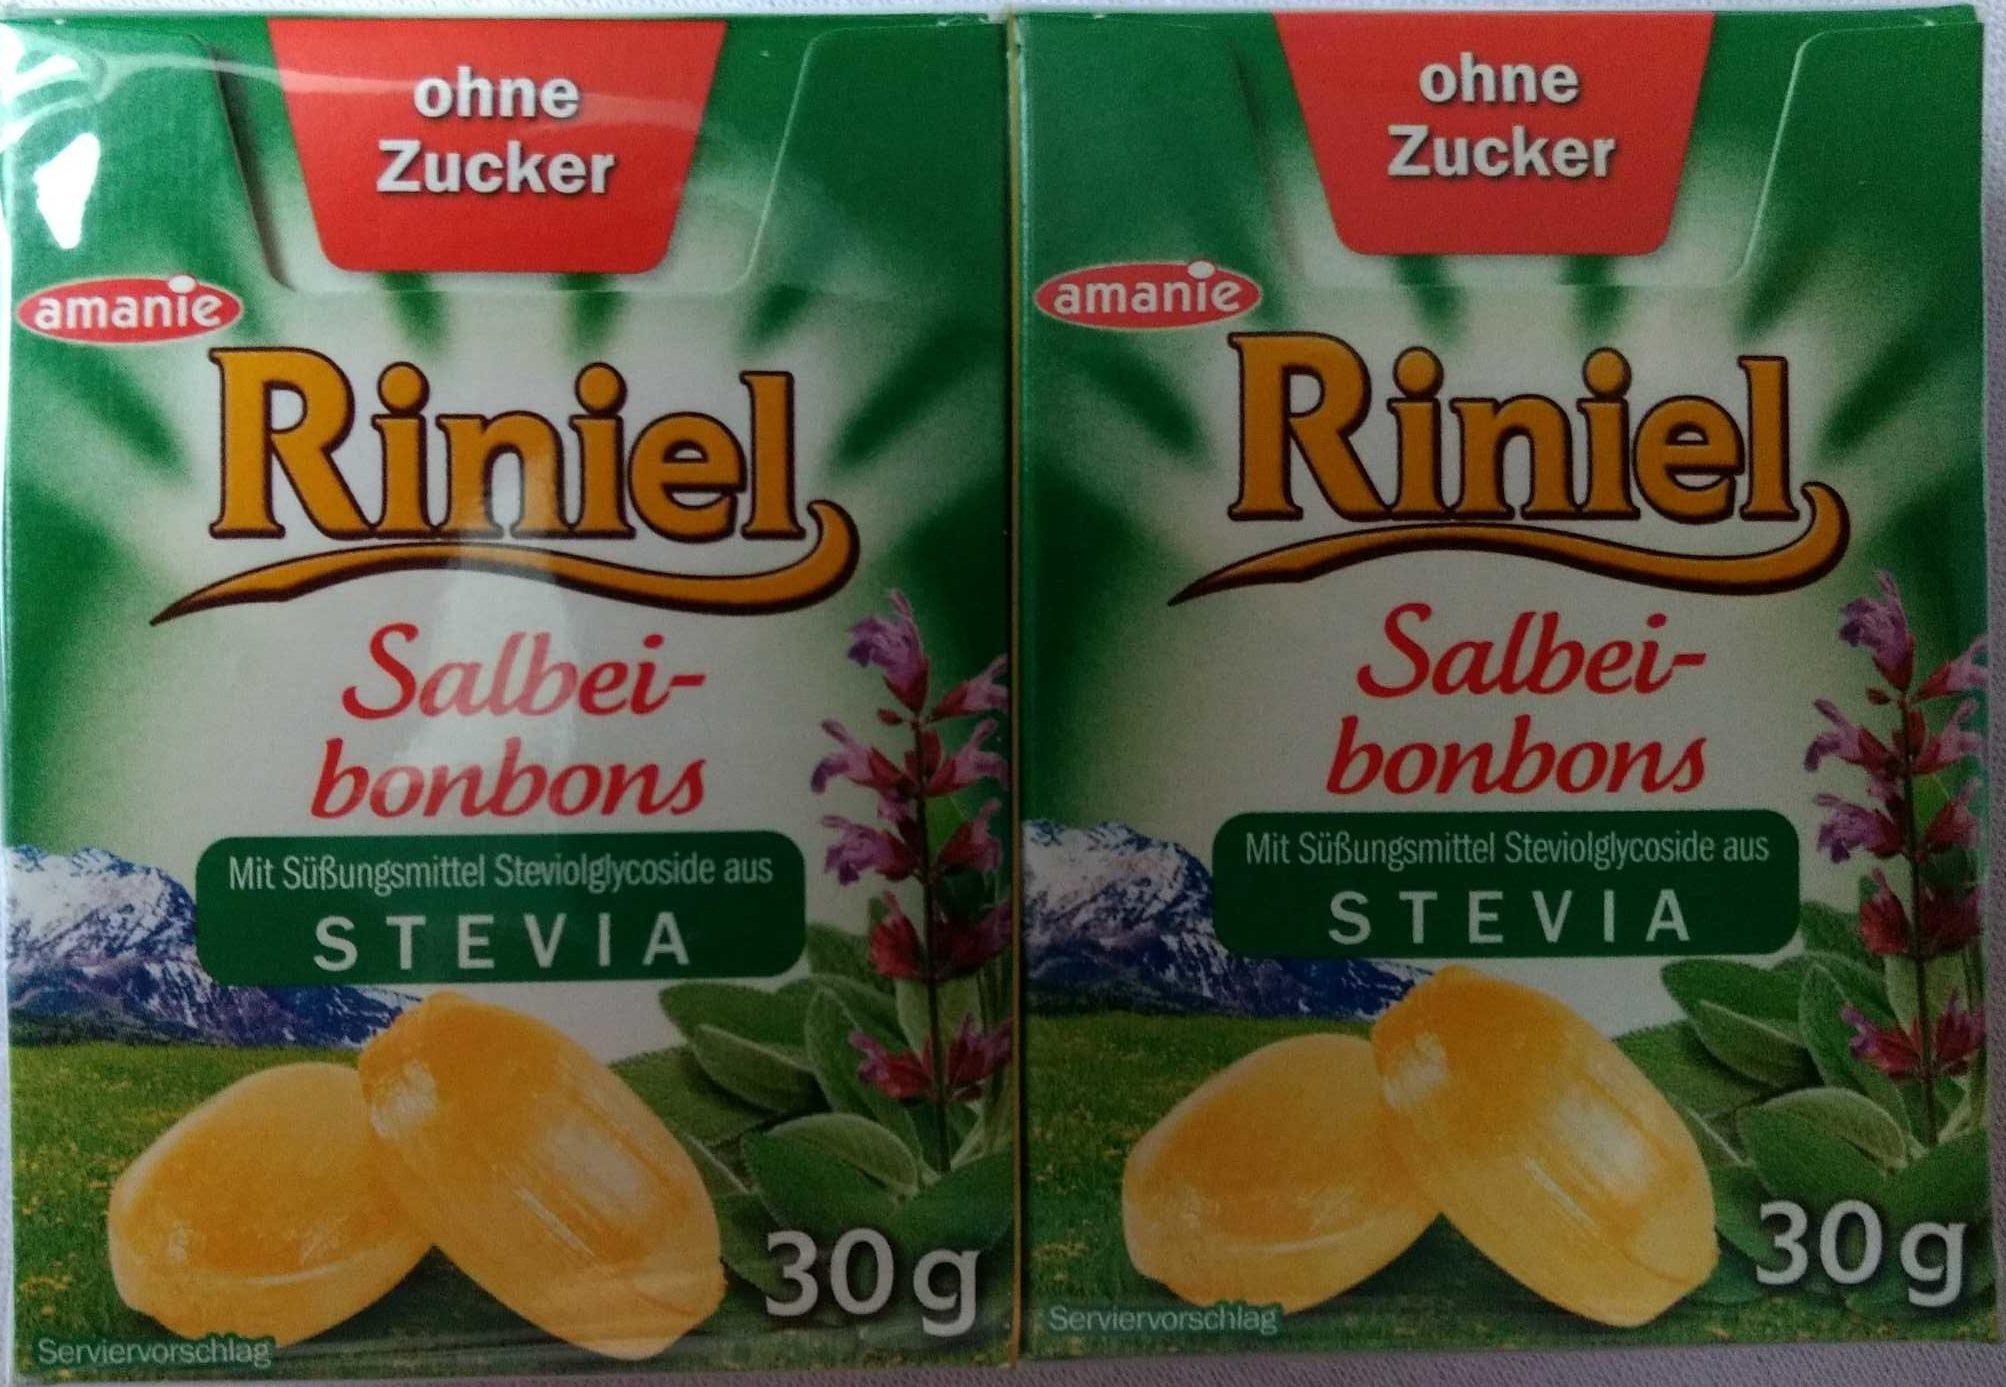 Riniel Ohne Zucker, Salbei Bonbons - Product - de